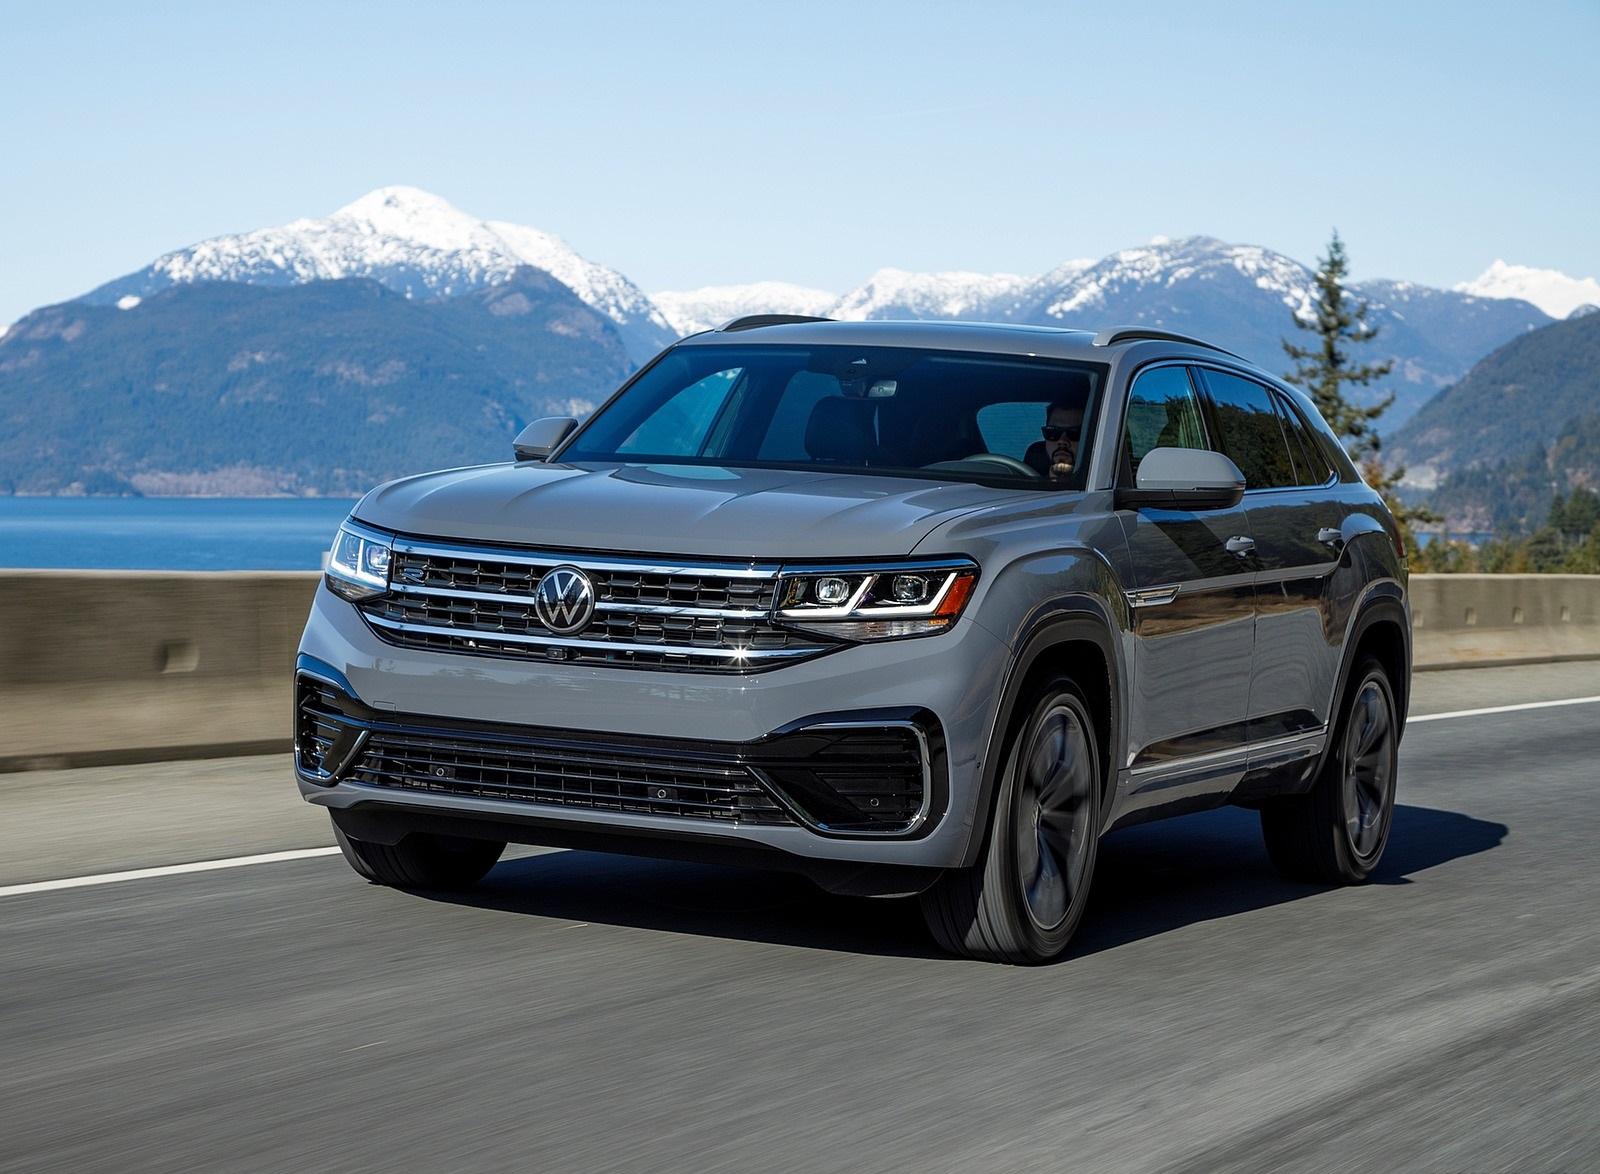 2020 Volkswagen Atlas Cross Sport SEL Premium R Line (Color: Pure Gray) Front Three-Quarter Wallpapers (1)